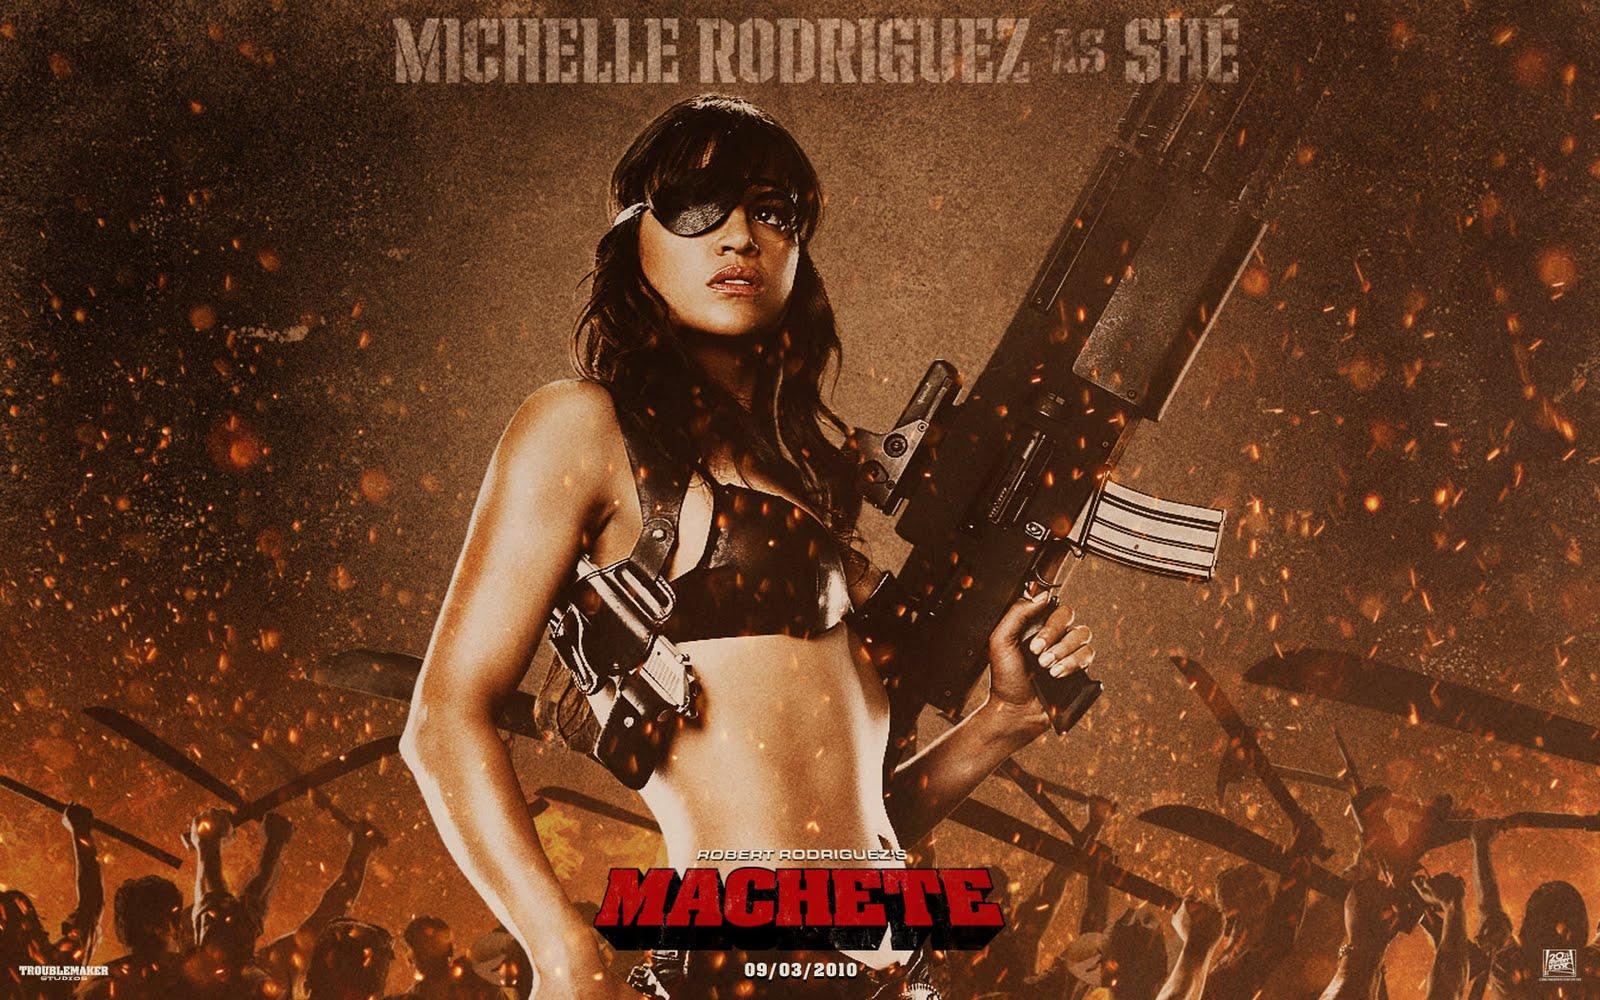 http://3.bp.blogspot.com/-Y4K0vAREE90/T_ZTCxXRGeI/AAAAAAAApf4/RtKHdToFwzw/s1600/Michelle-Rodriguez-In-Machete-Wallpapers.jpg